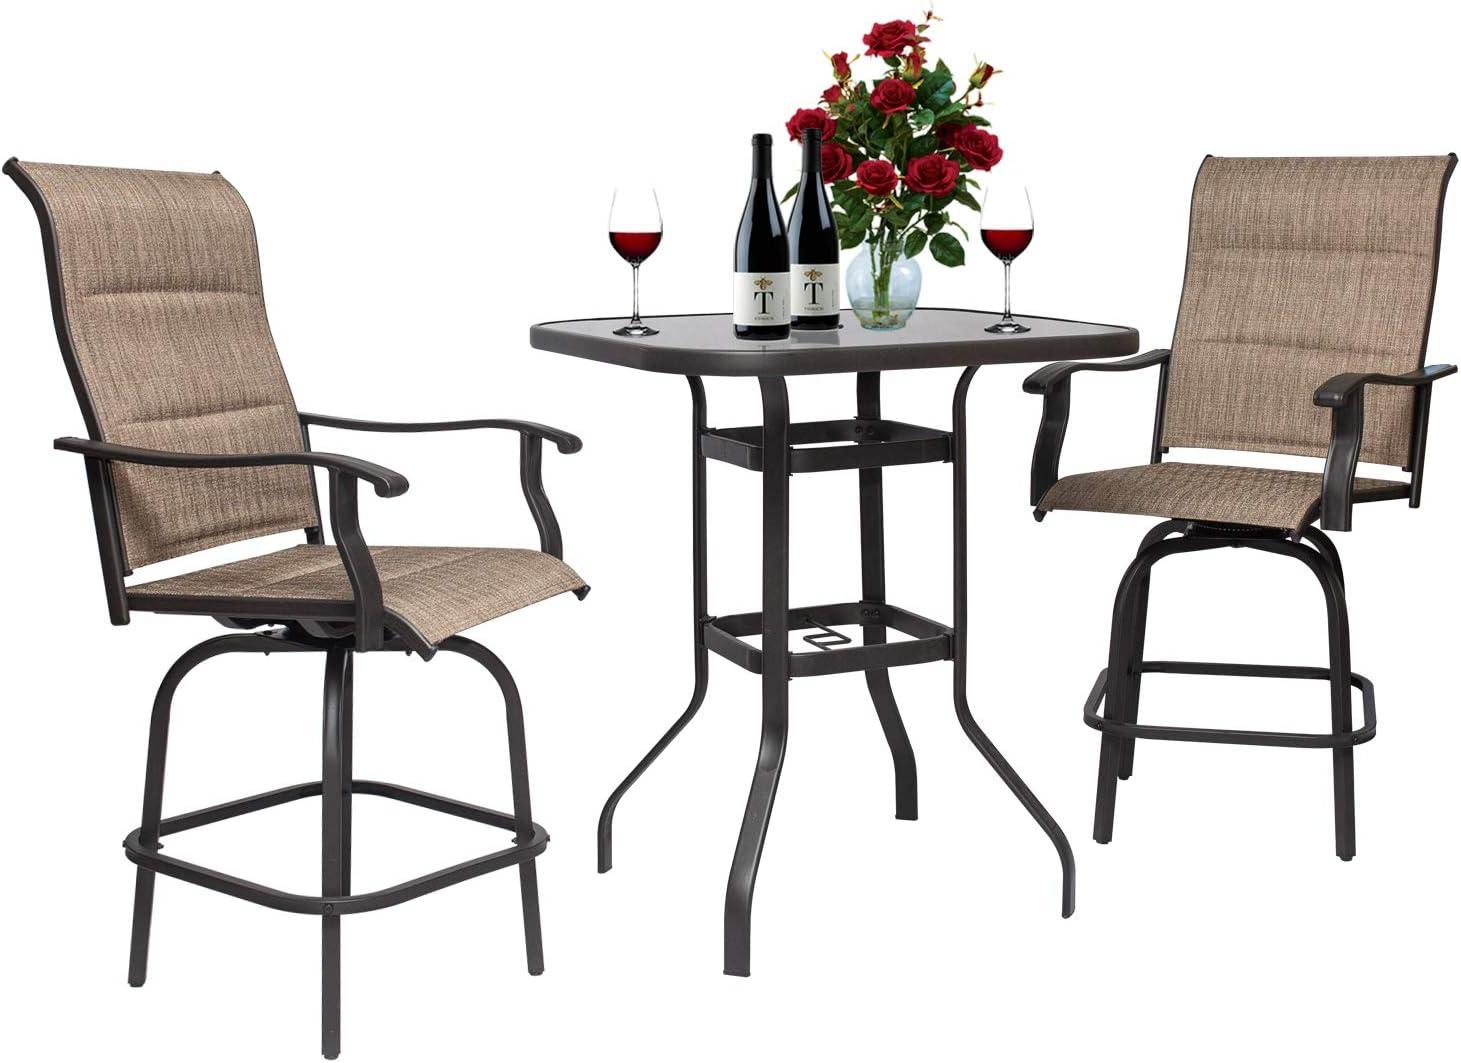 Buy On Shine 10 PCS Outdoor Furniture Patio Swivel Bar Set Height ...